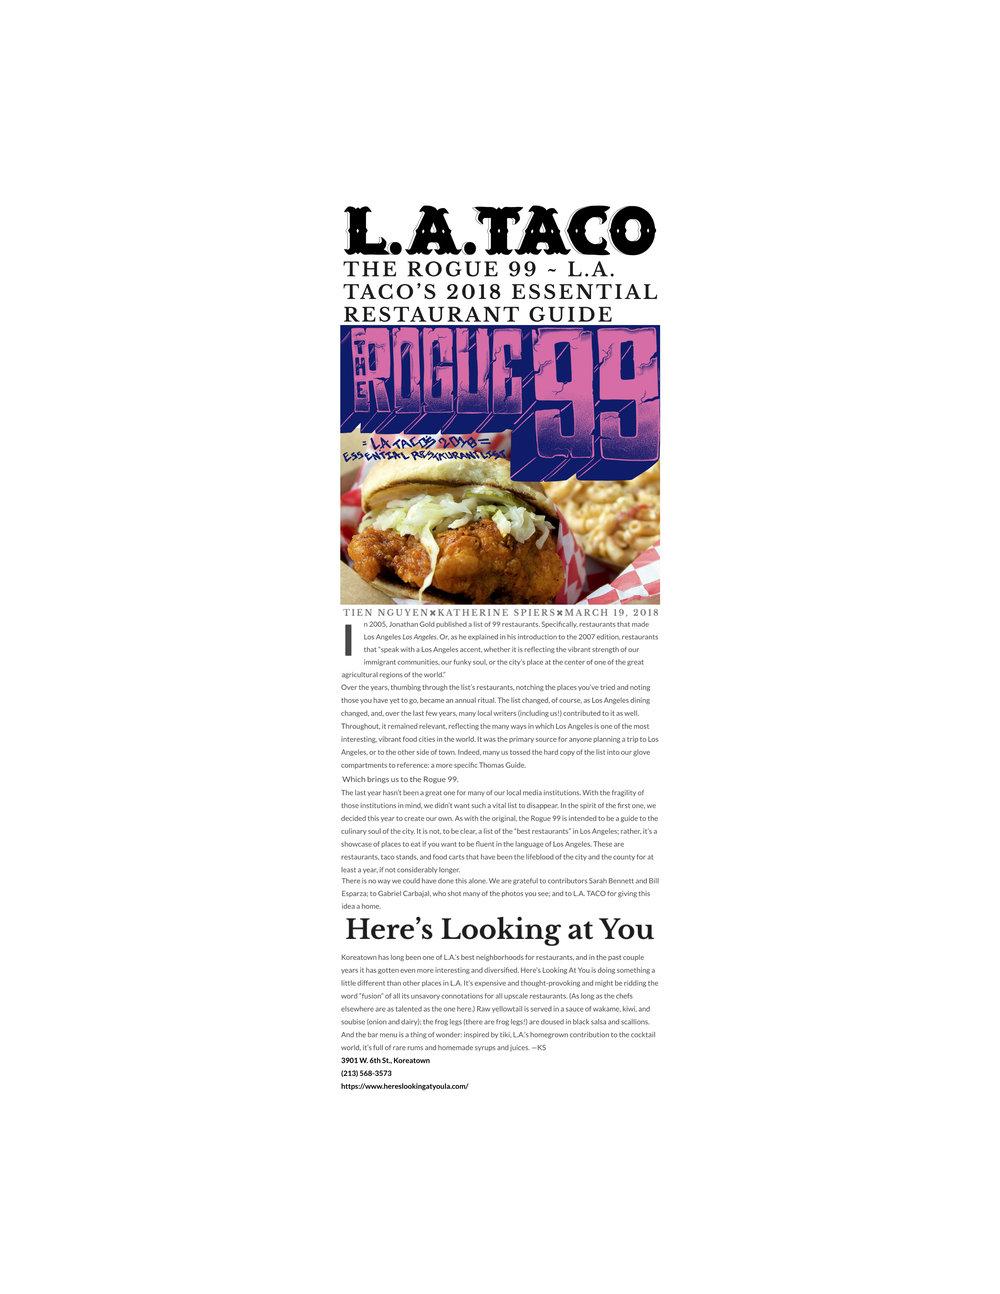 LATaco_031918.jpg